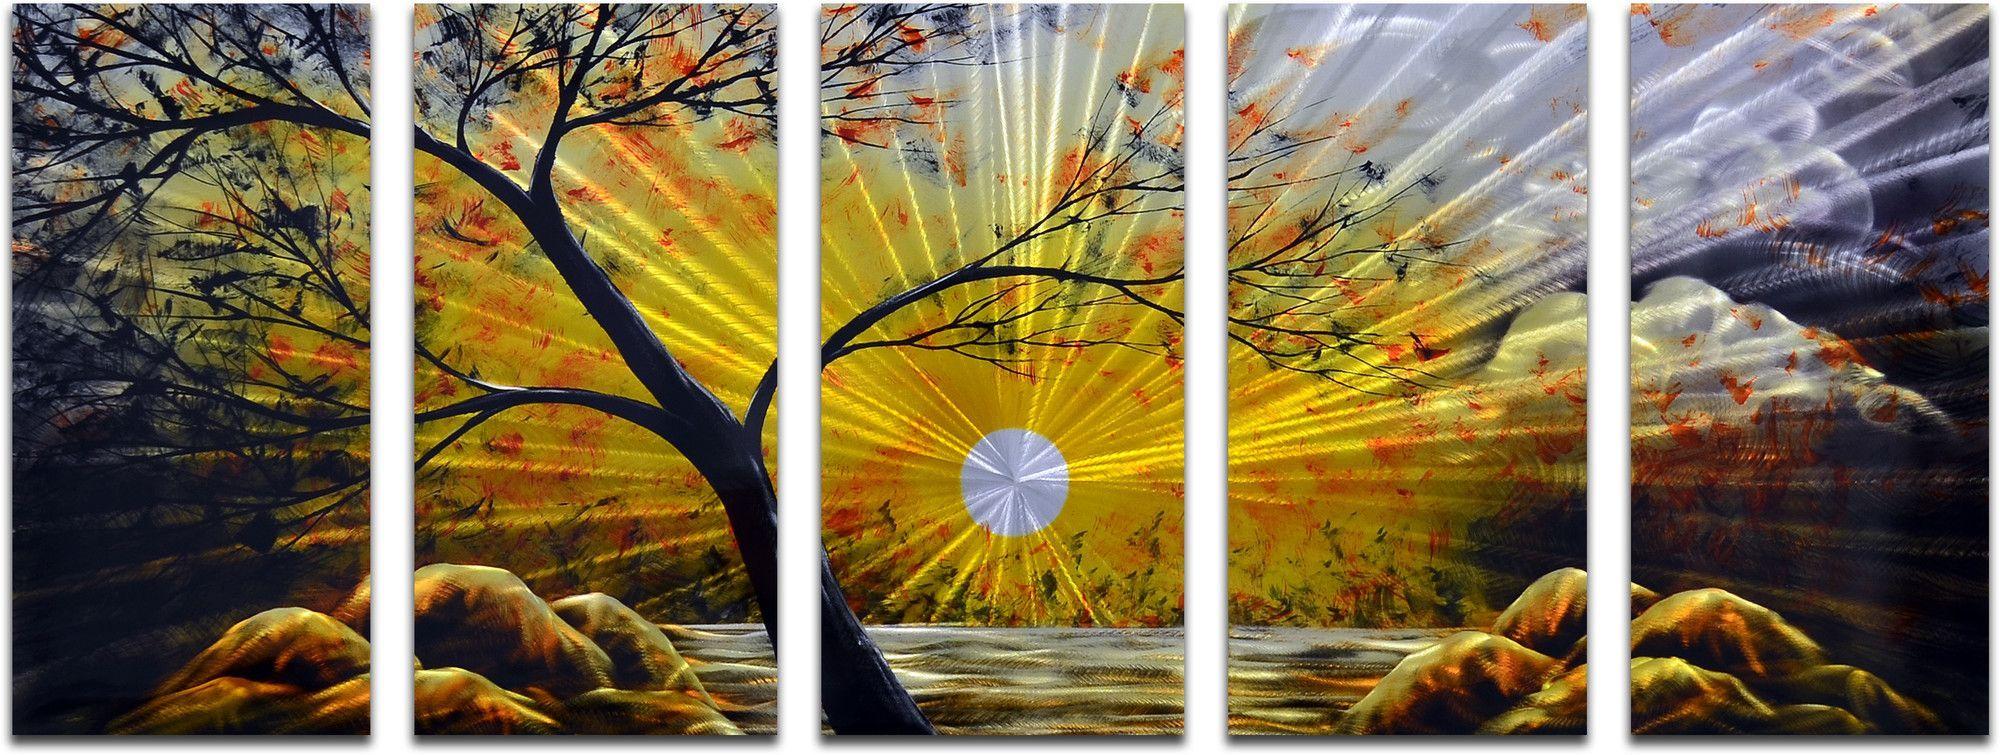 5 Piece Mother Natures Finest Wall Décor Set | Products | Pinterest ...